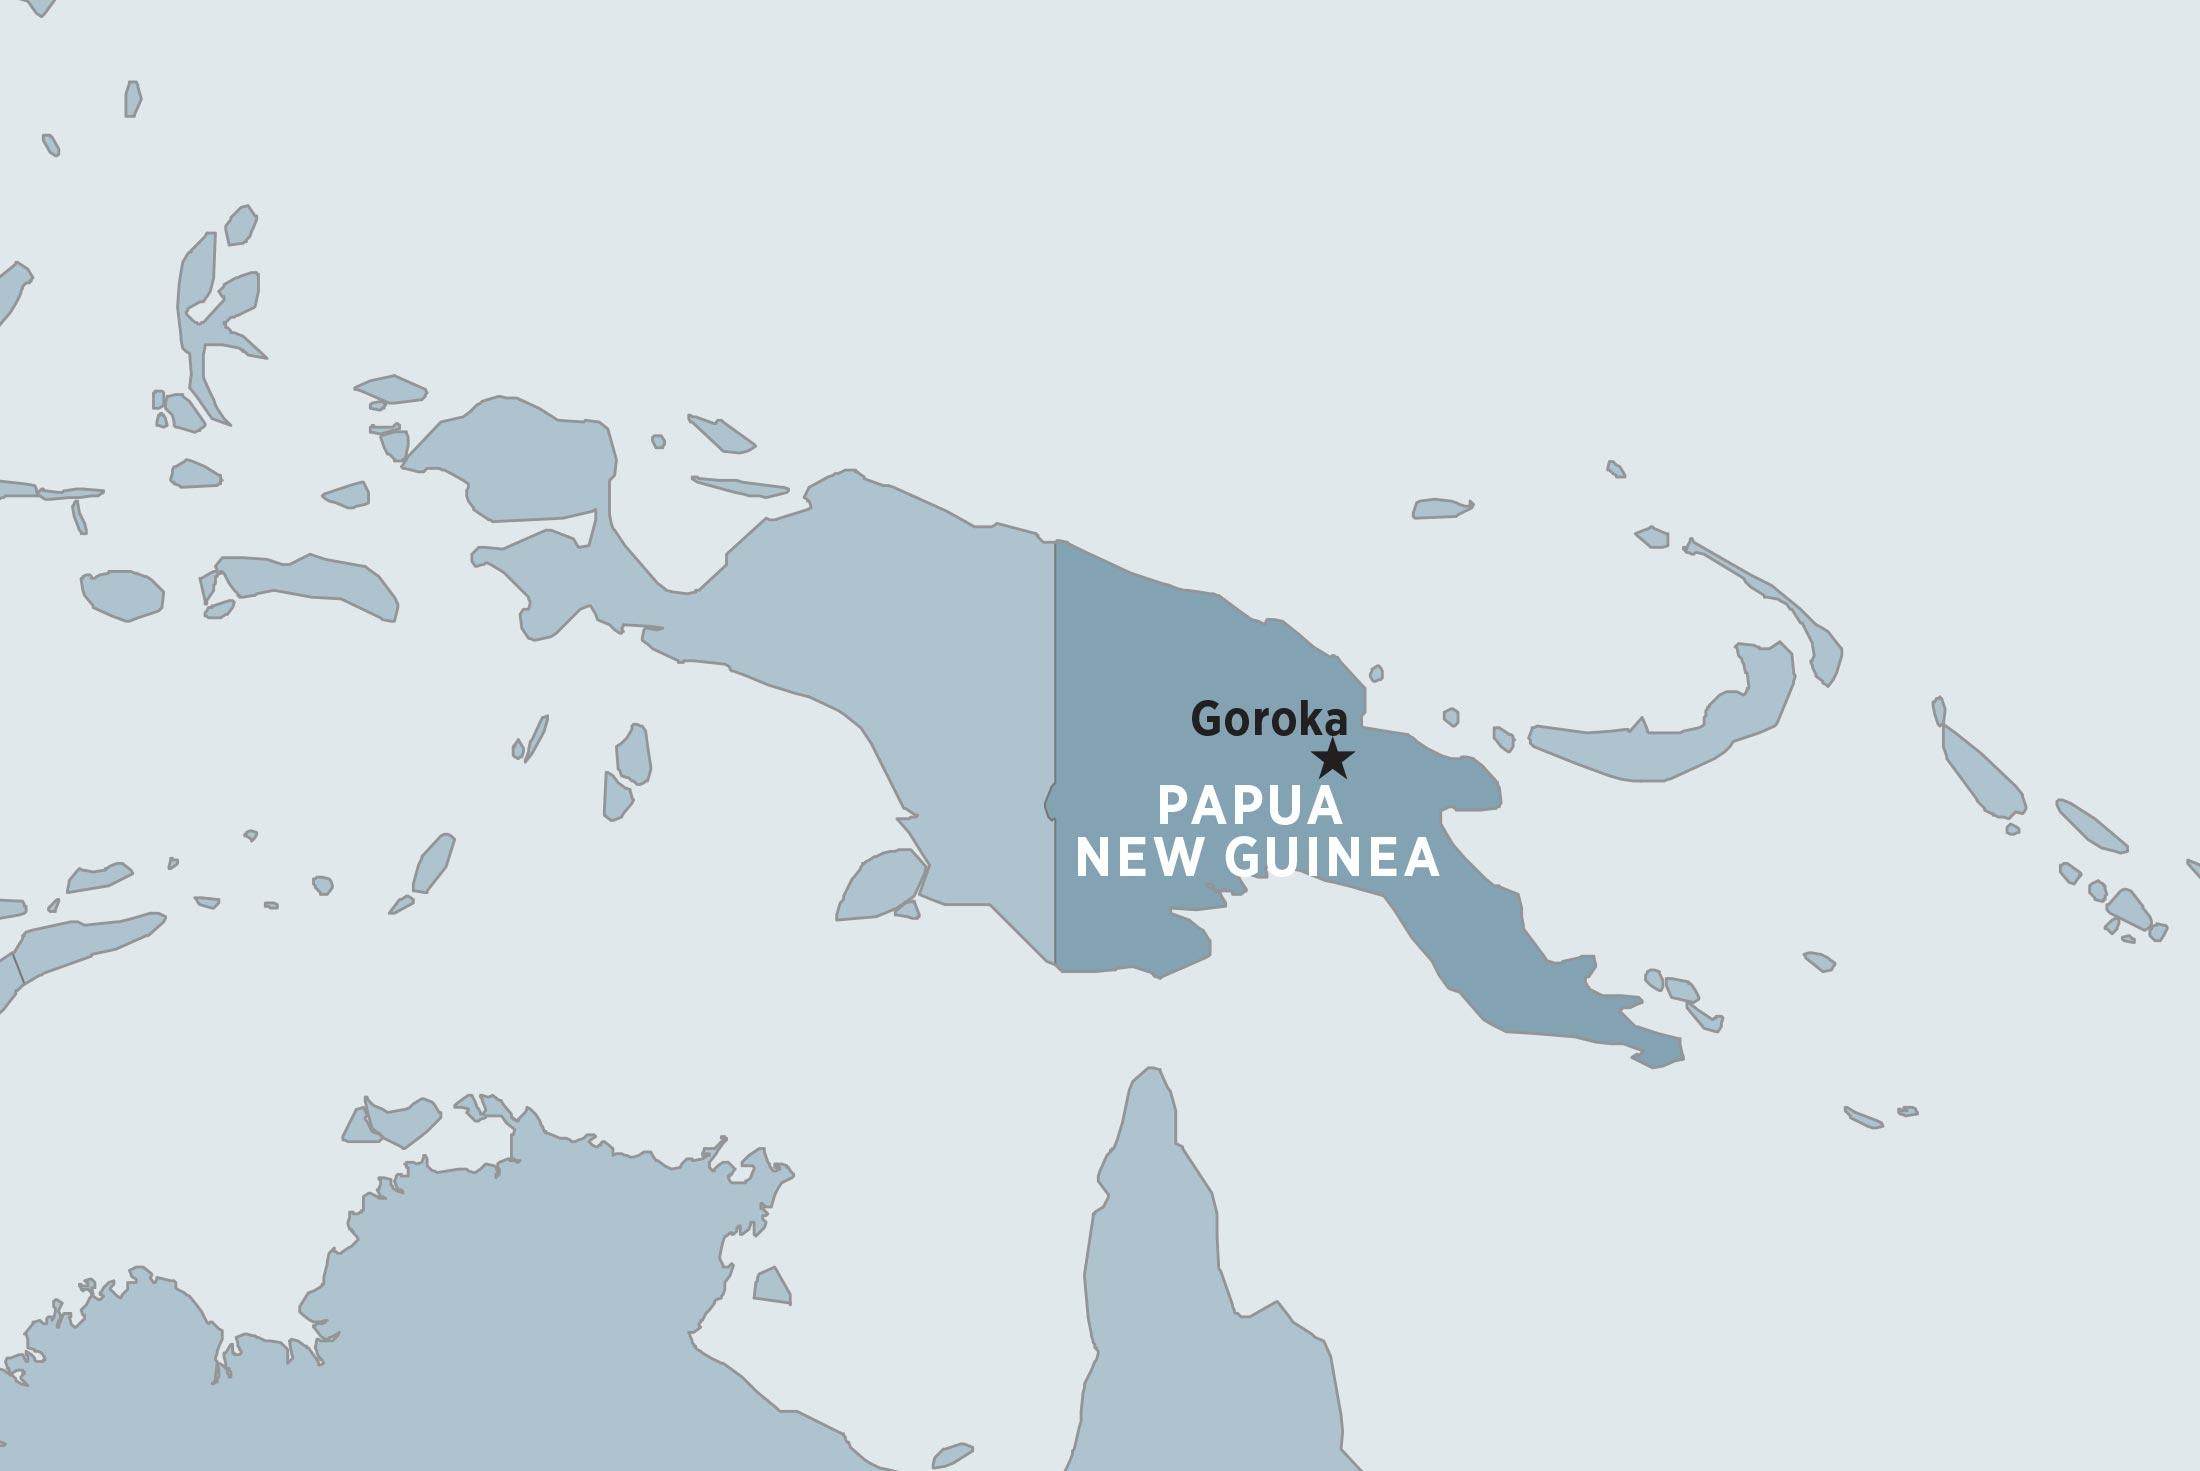 Goroka Show, Papua New Guinea - Limited Edition overview | Goroka Show,  Papua New Guinea - Limited Edition